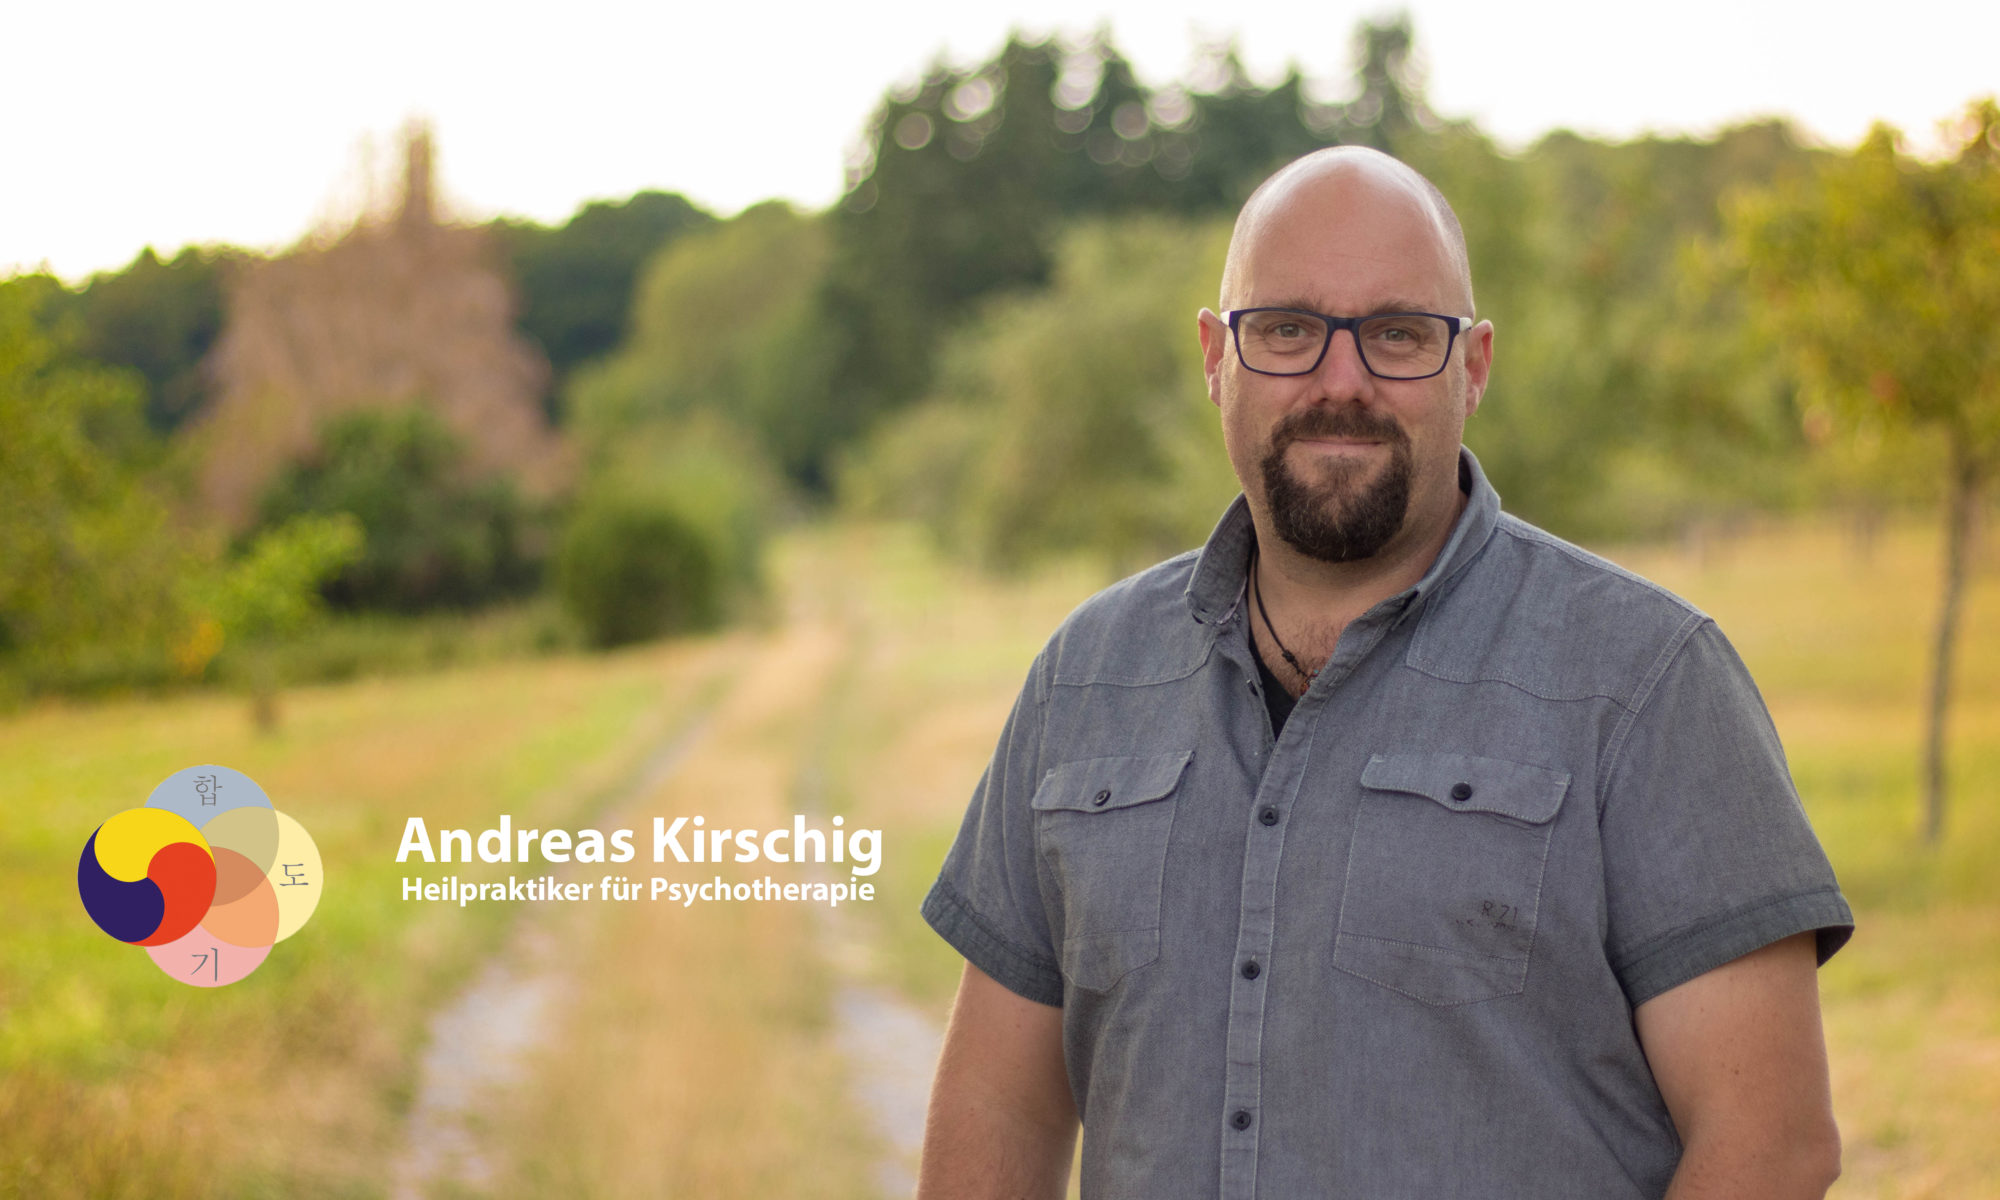 Andreas Kirschig